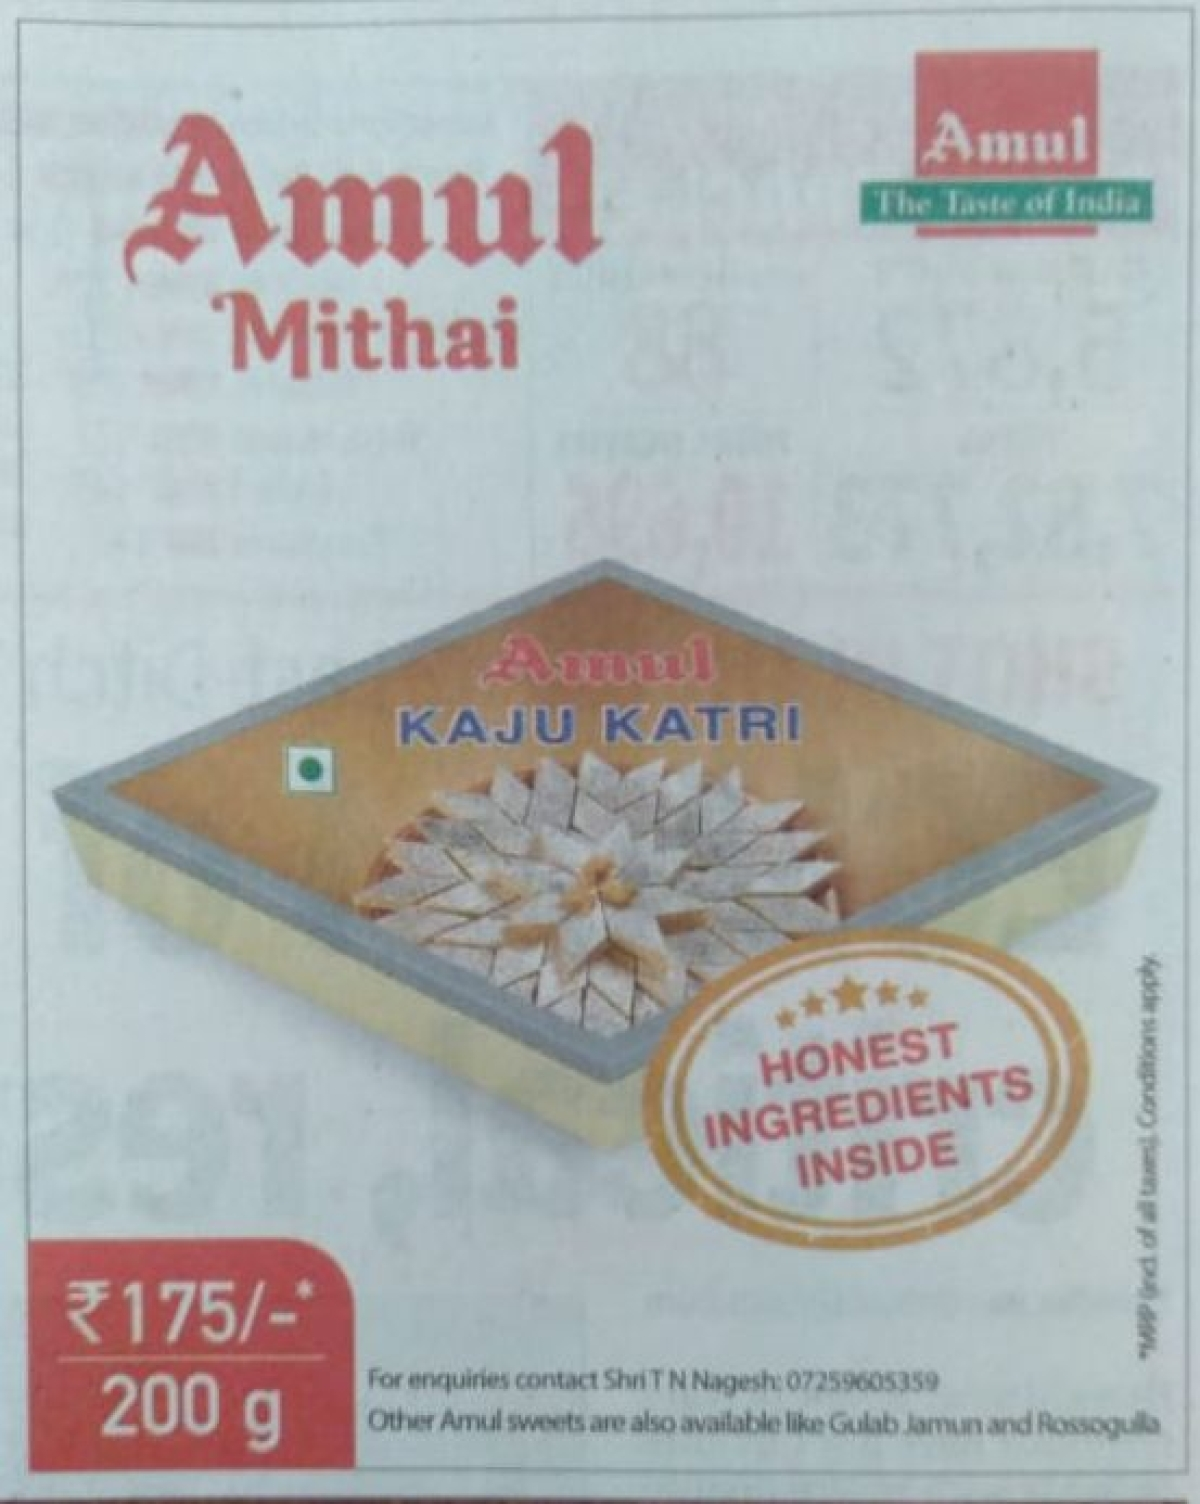 Print ad for Kaju Katri